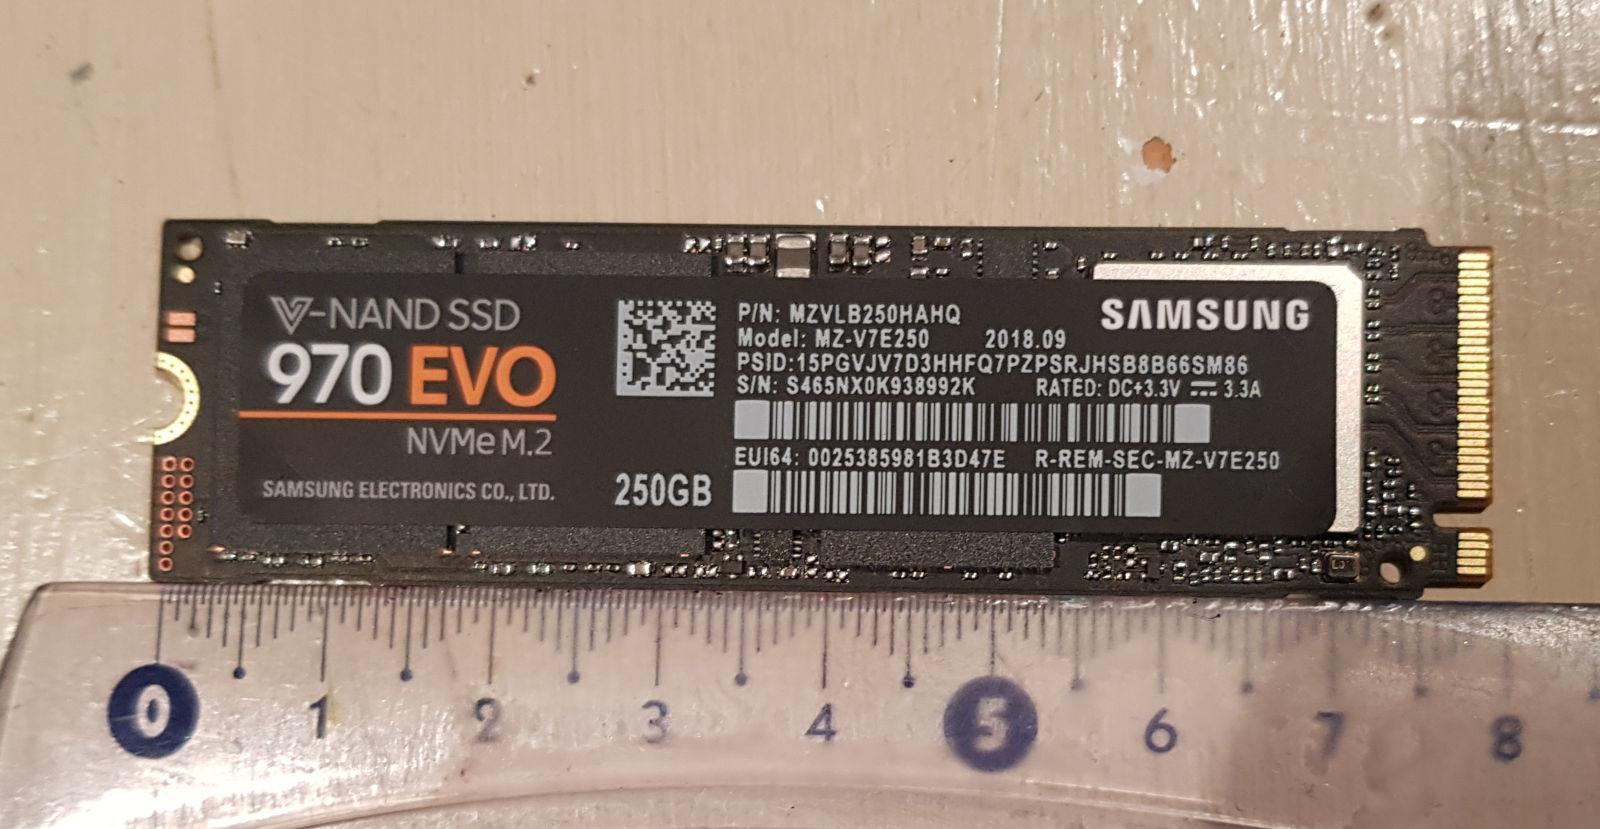 Installing Arcolinux On Samsung 970 Evo Nvme M 2 Arcolinux Com